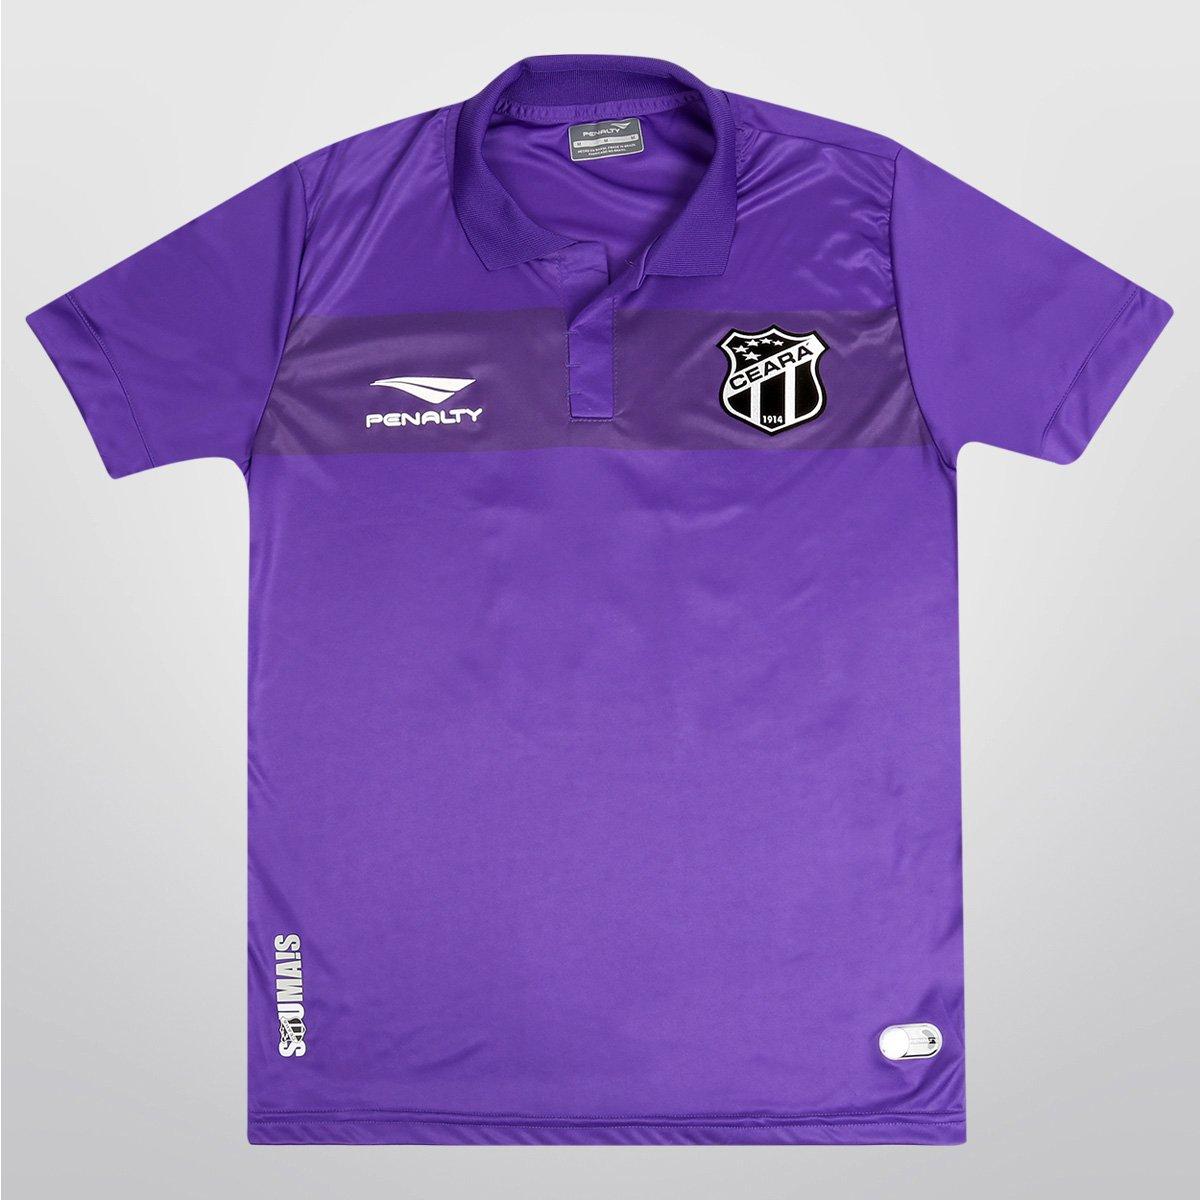 Camisa Penalty Ceará III 2015 nº 10 - Compre Agora  c20afdac820ab